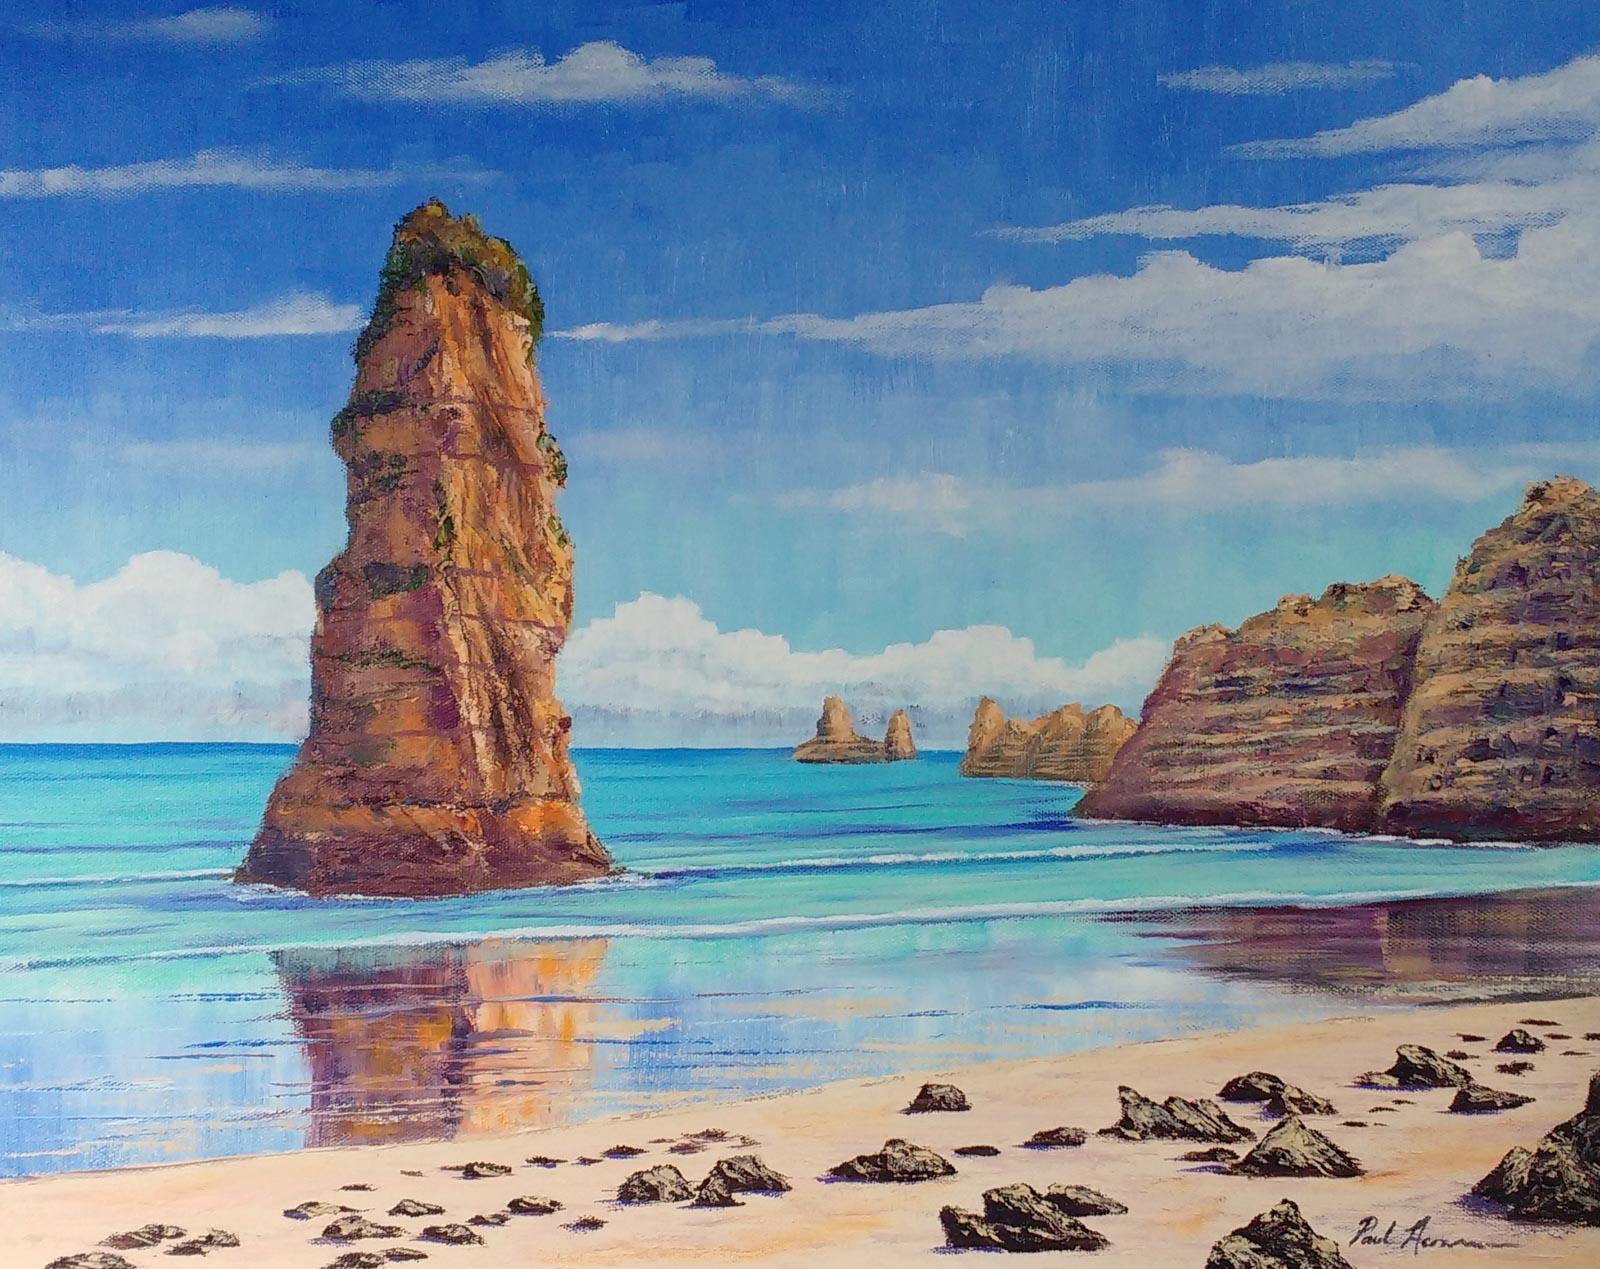 Paul Acraman-seascape-painting-Algarve-Praia Dona Ana, Lagos